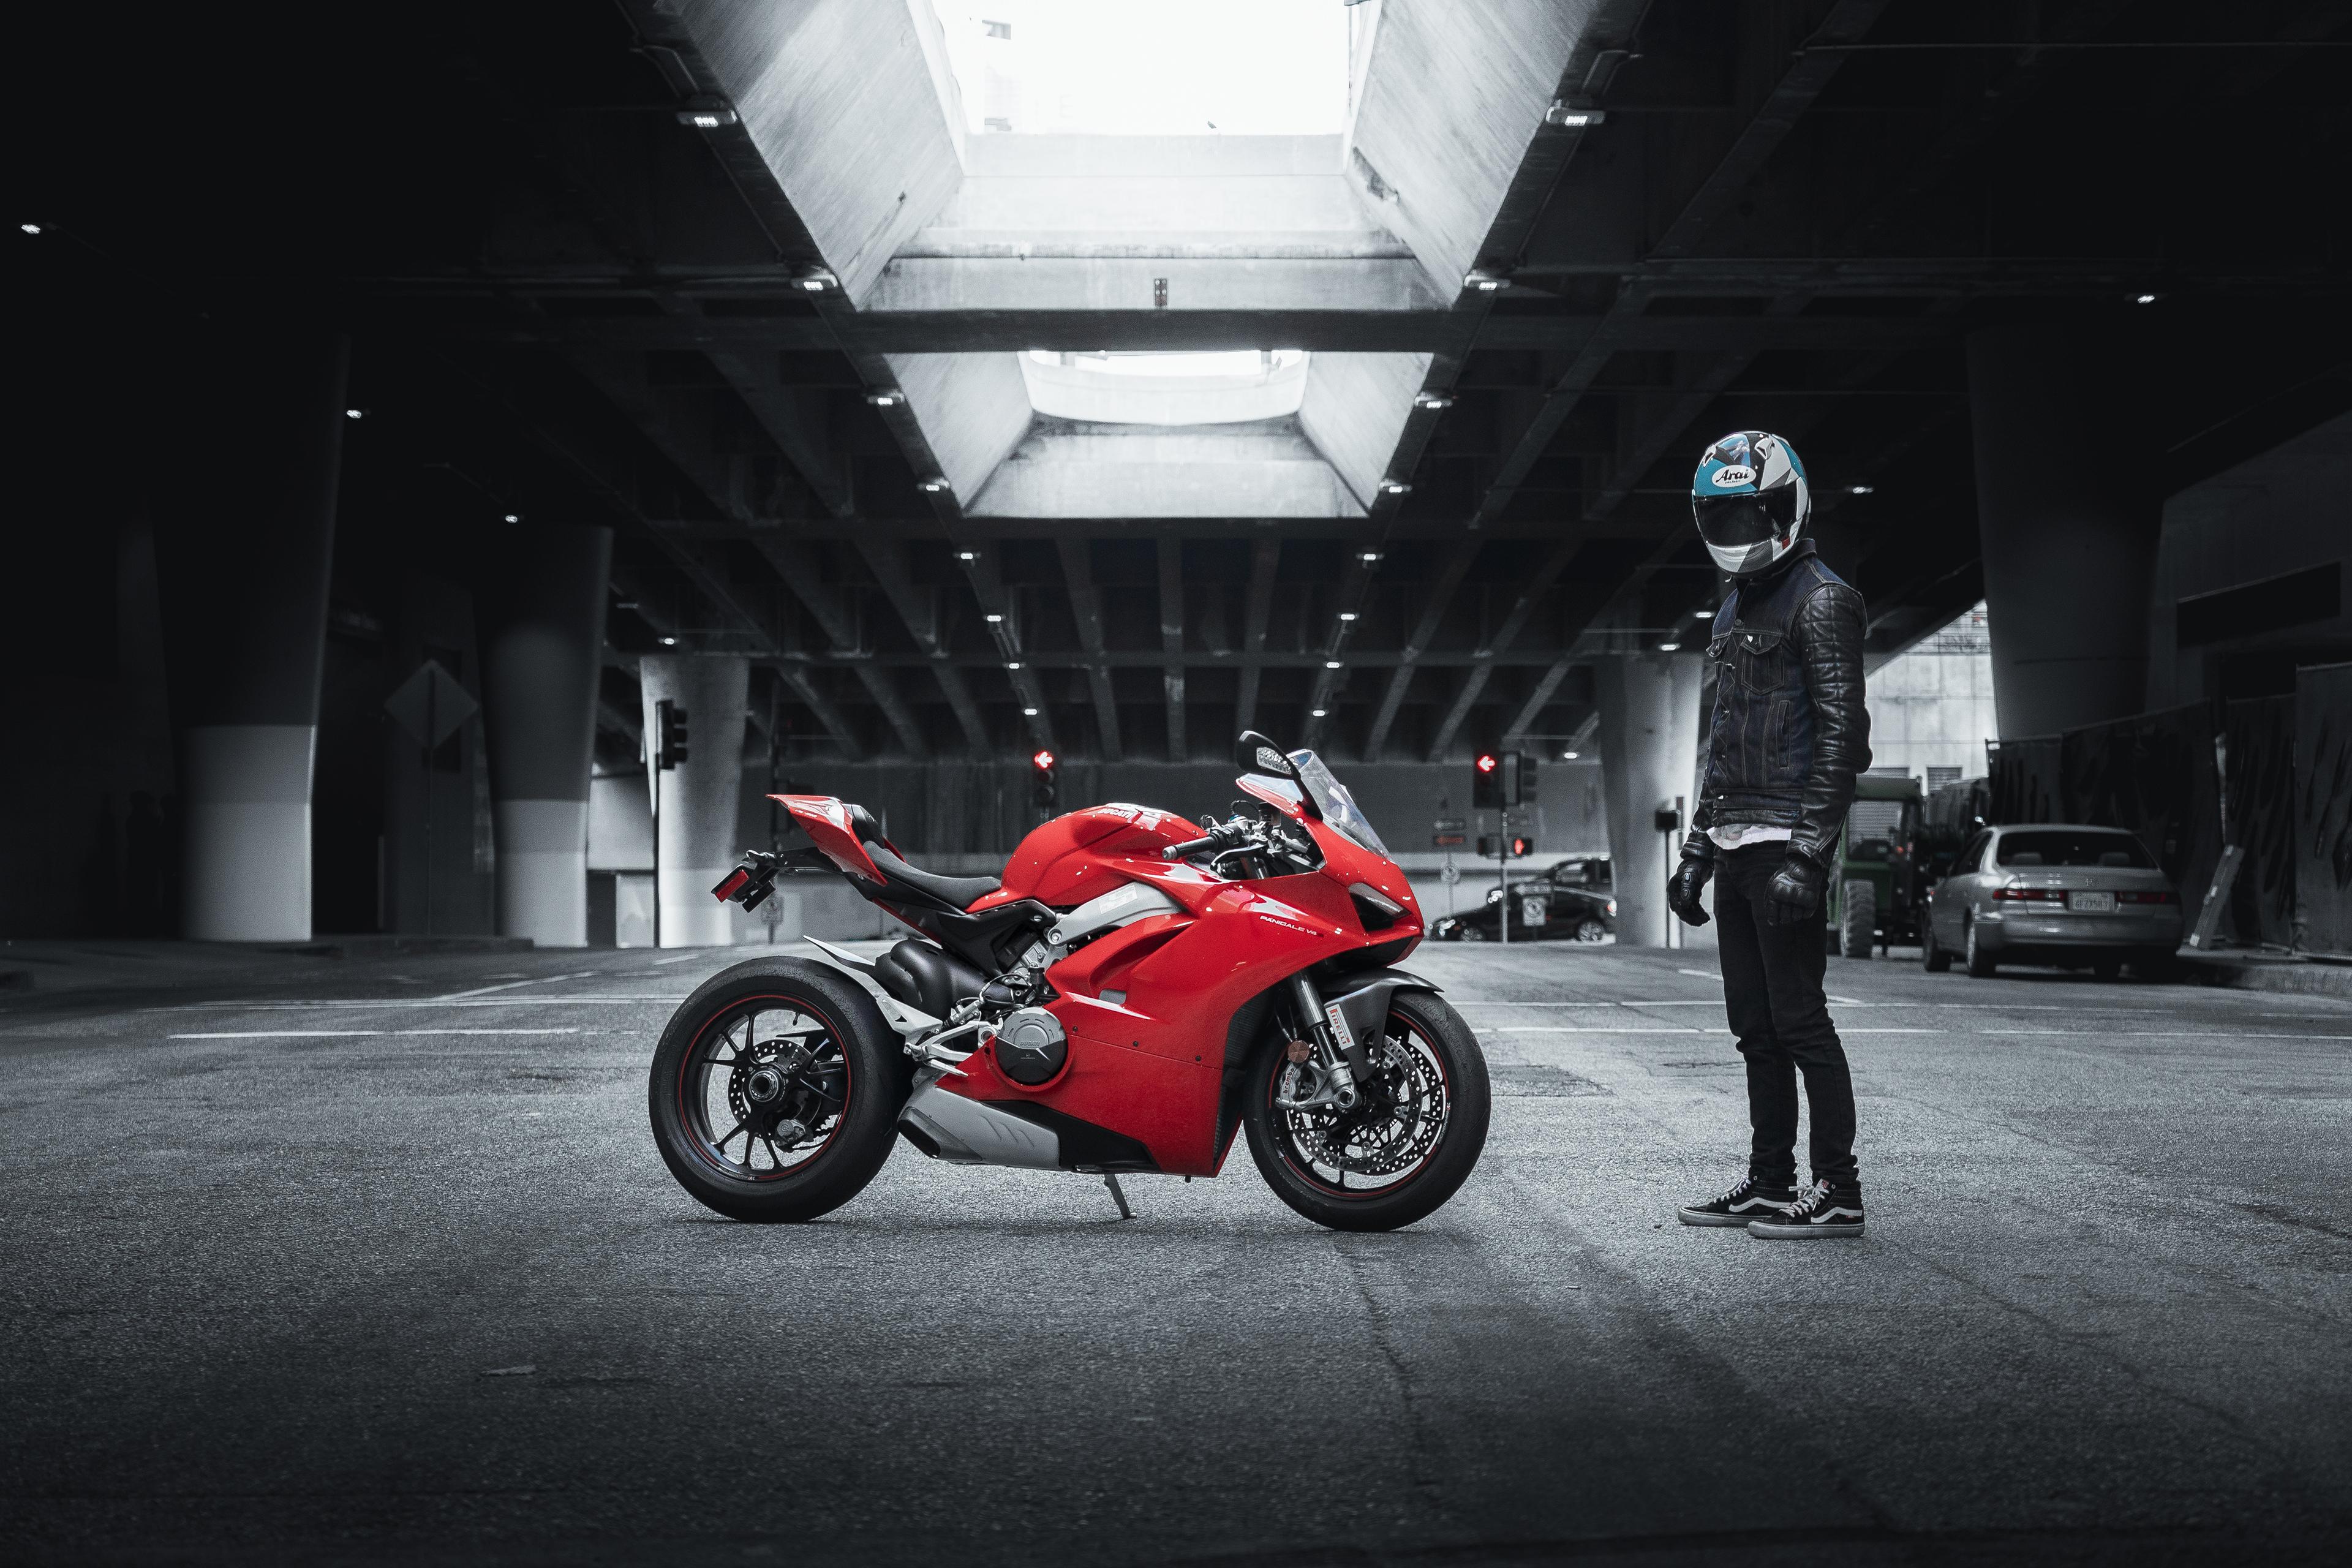 ducati 4k 1574943323 - Ducati 4k -